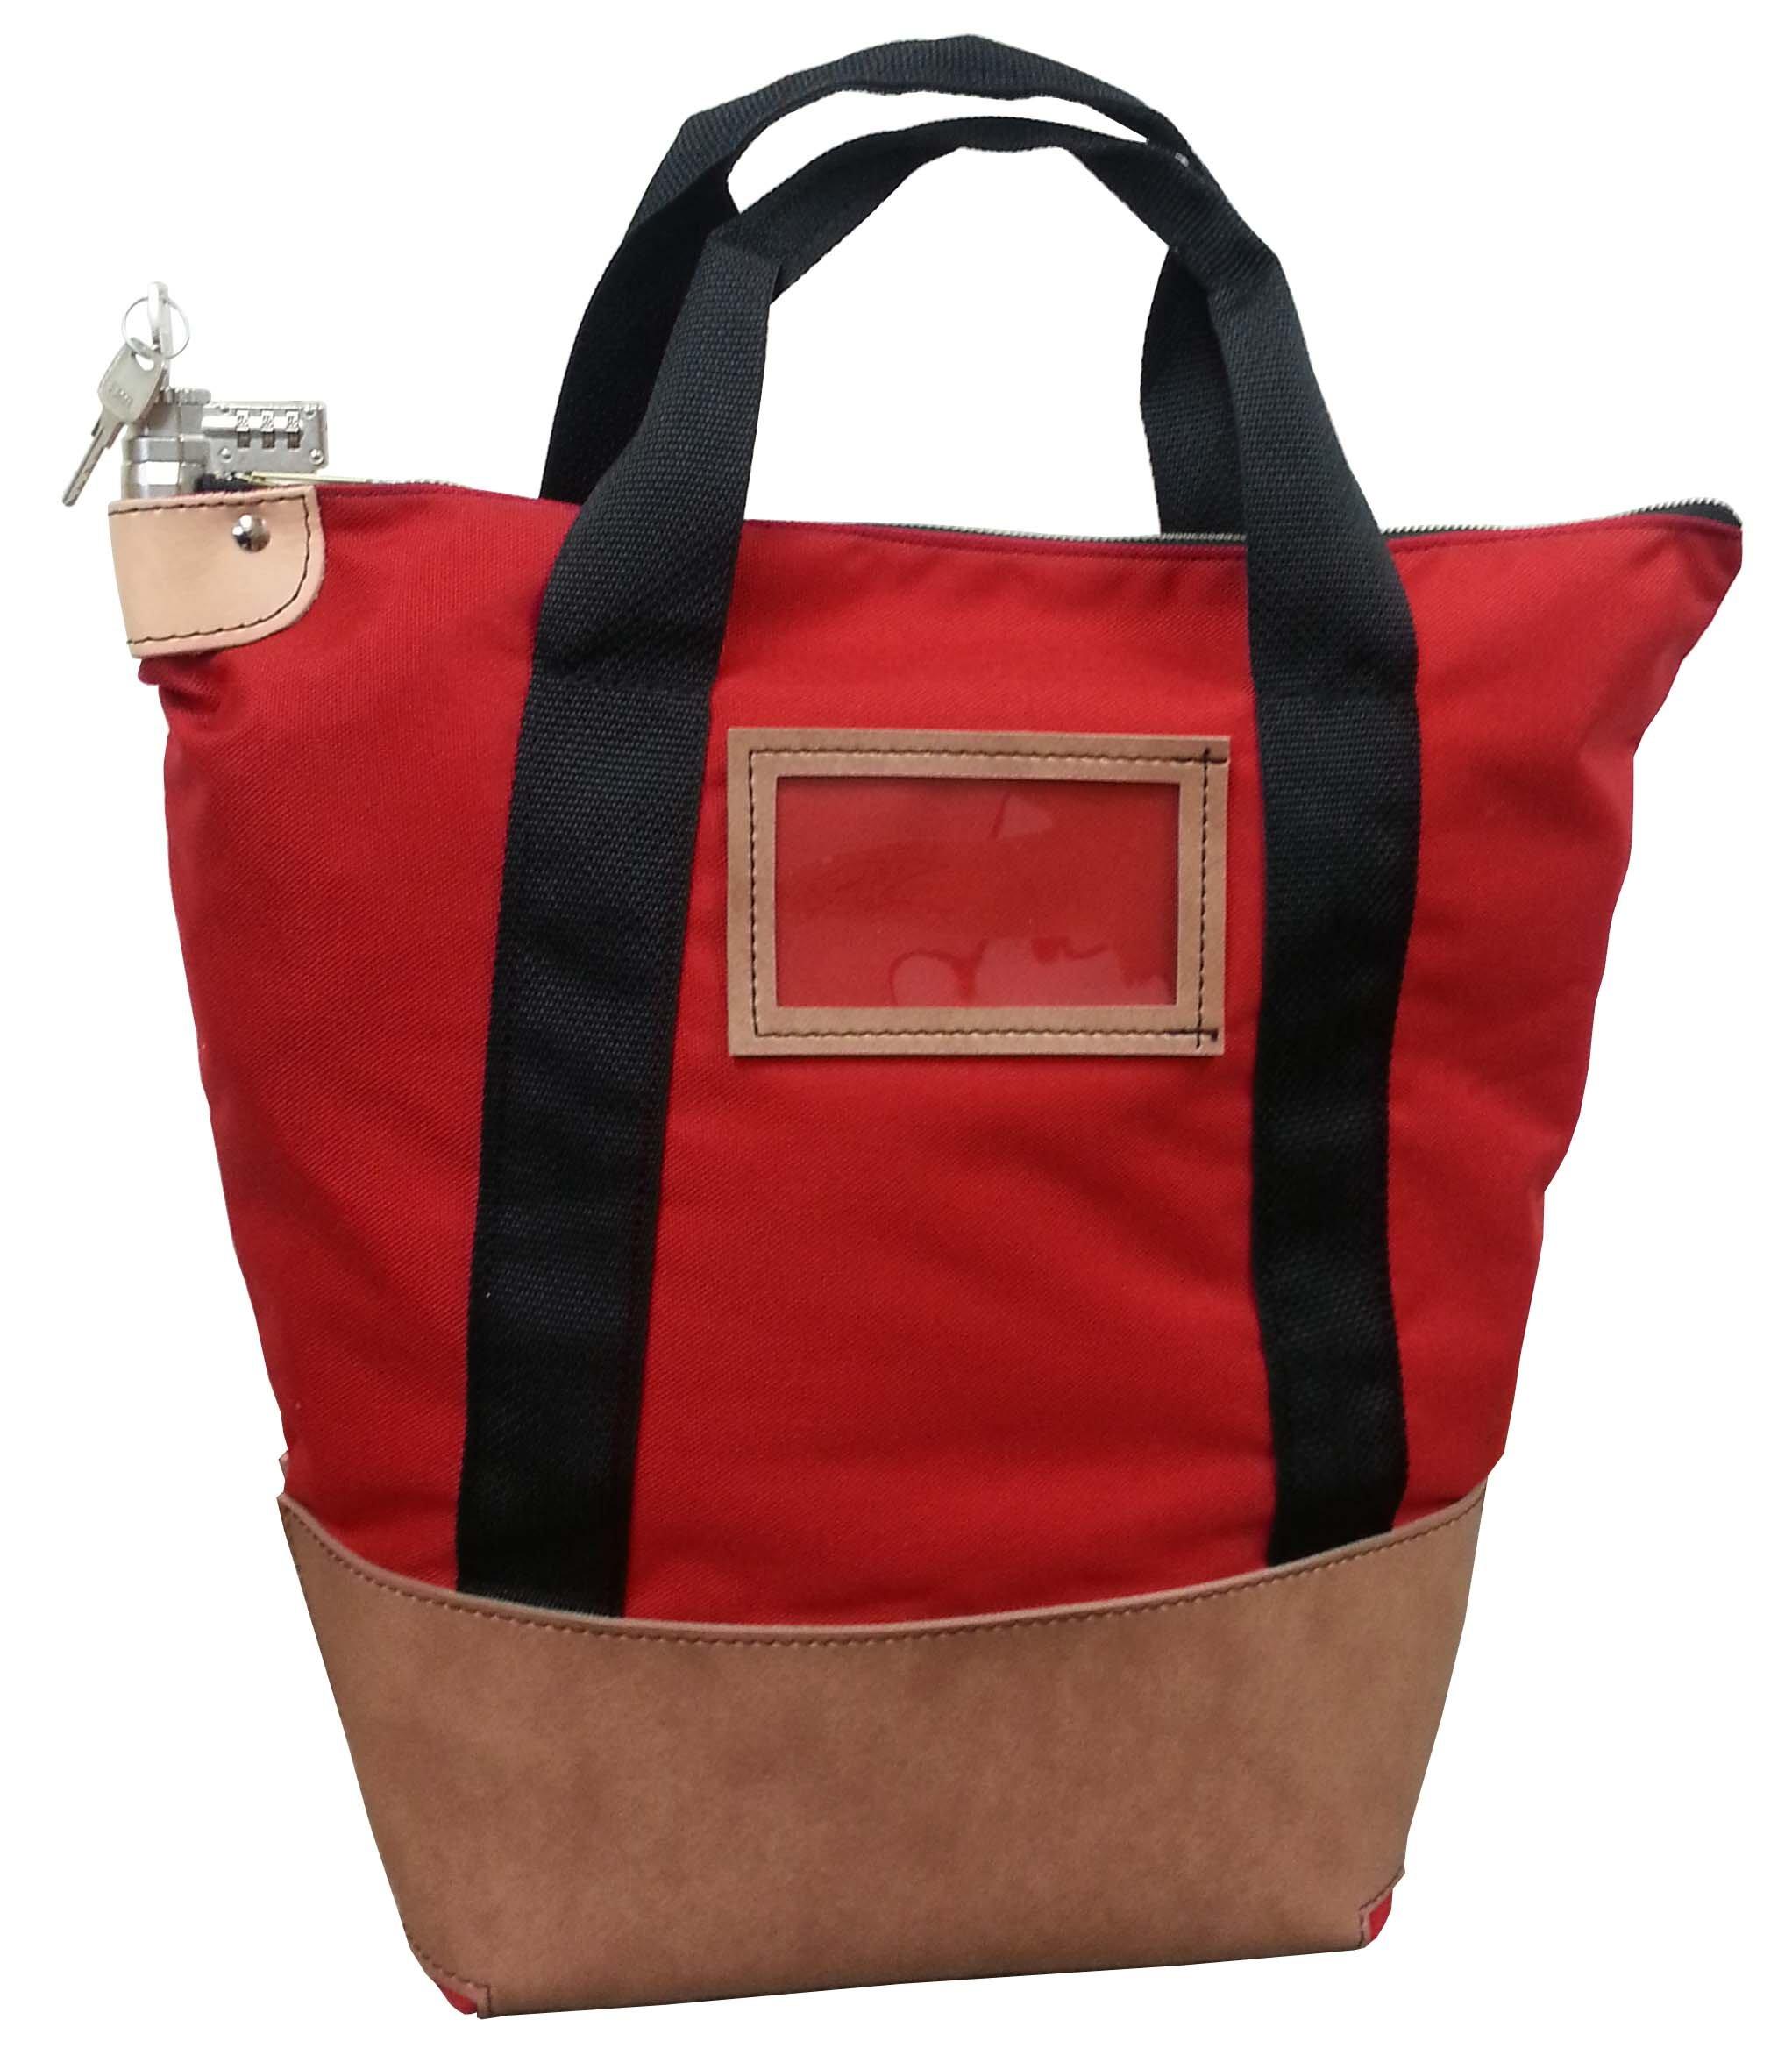 Locking Courier Bag 1000 Denier Nylon Combination Keyed Lock(Red)